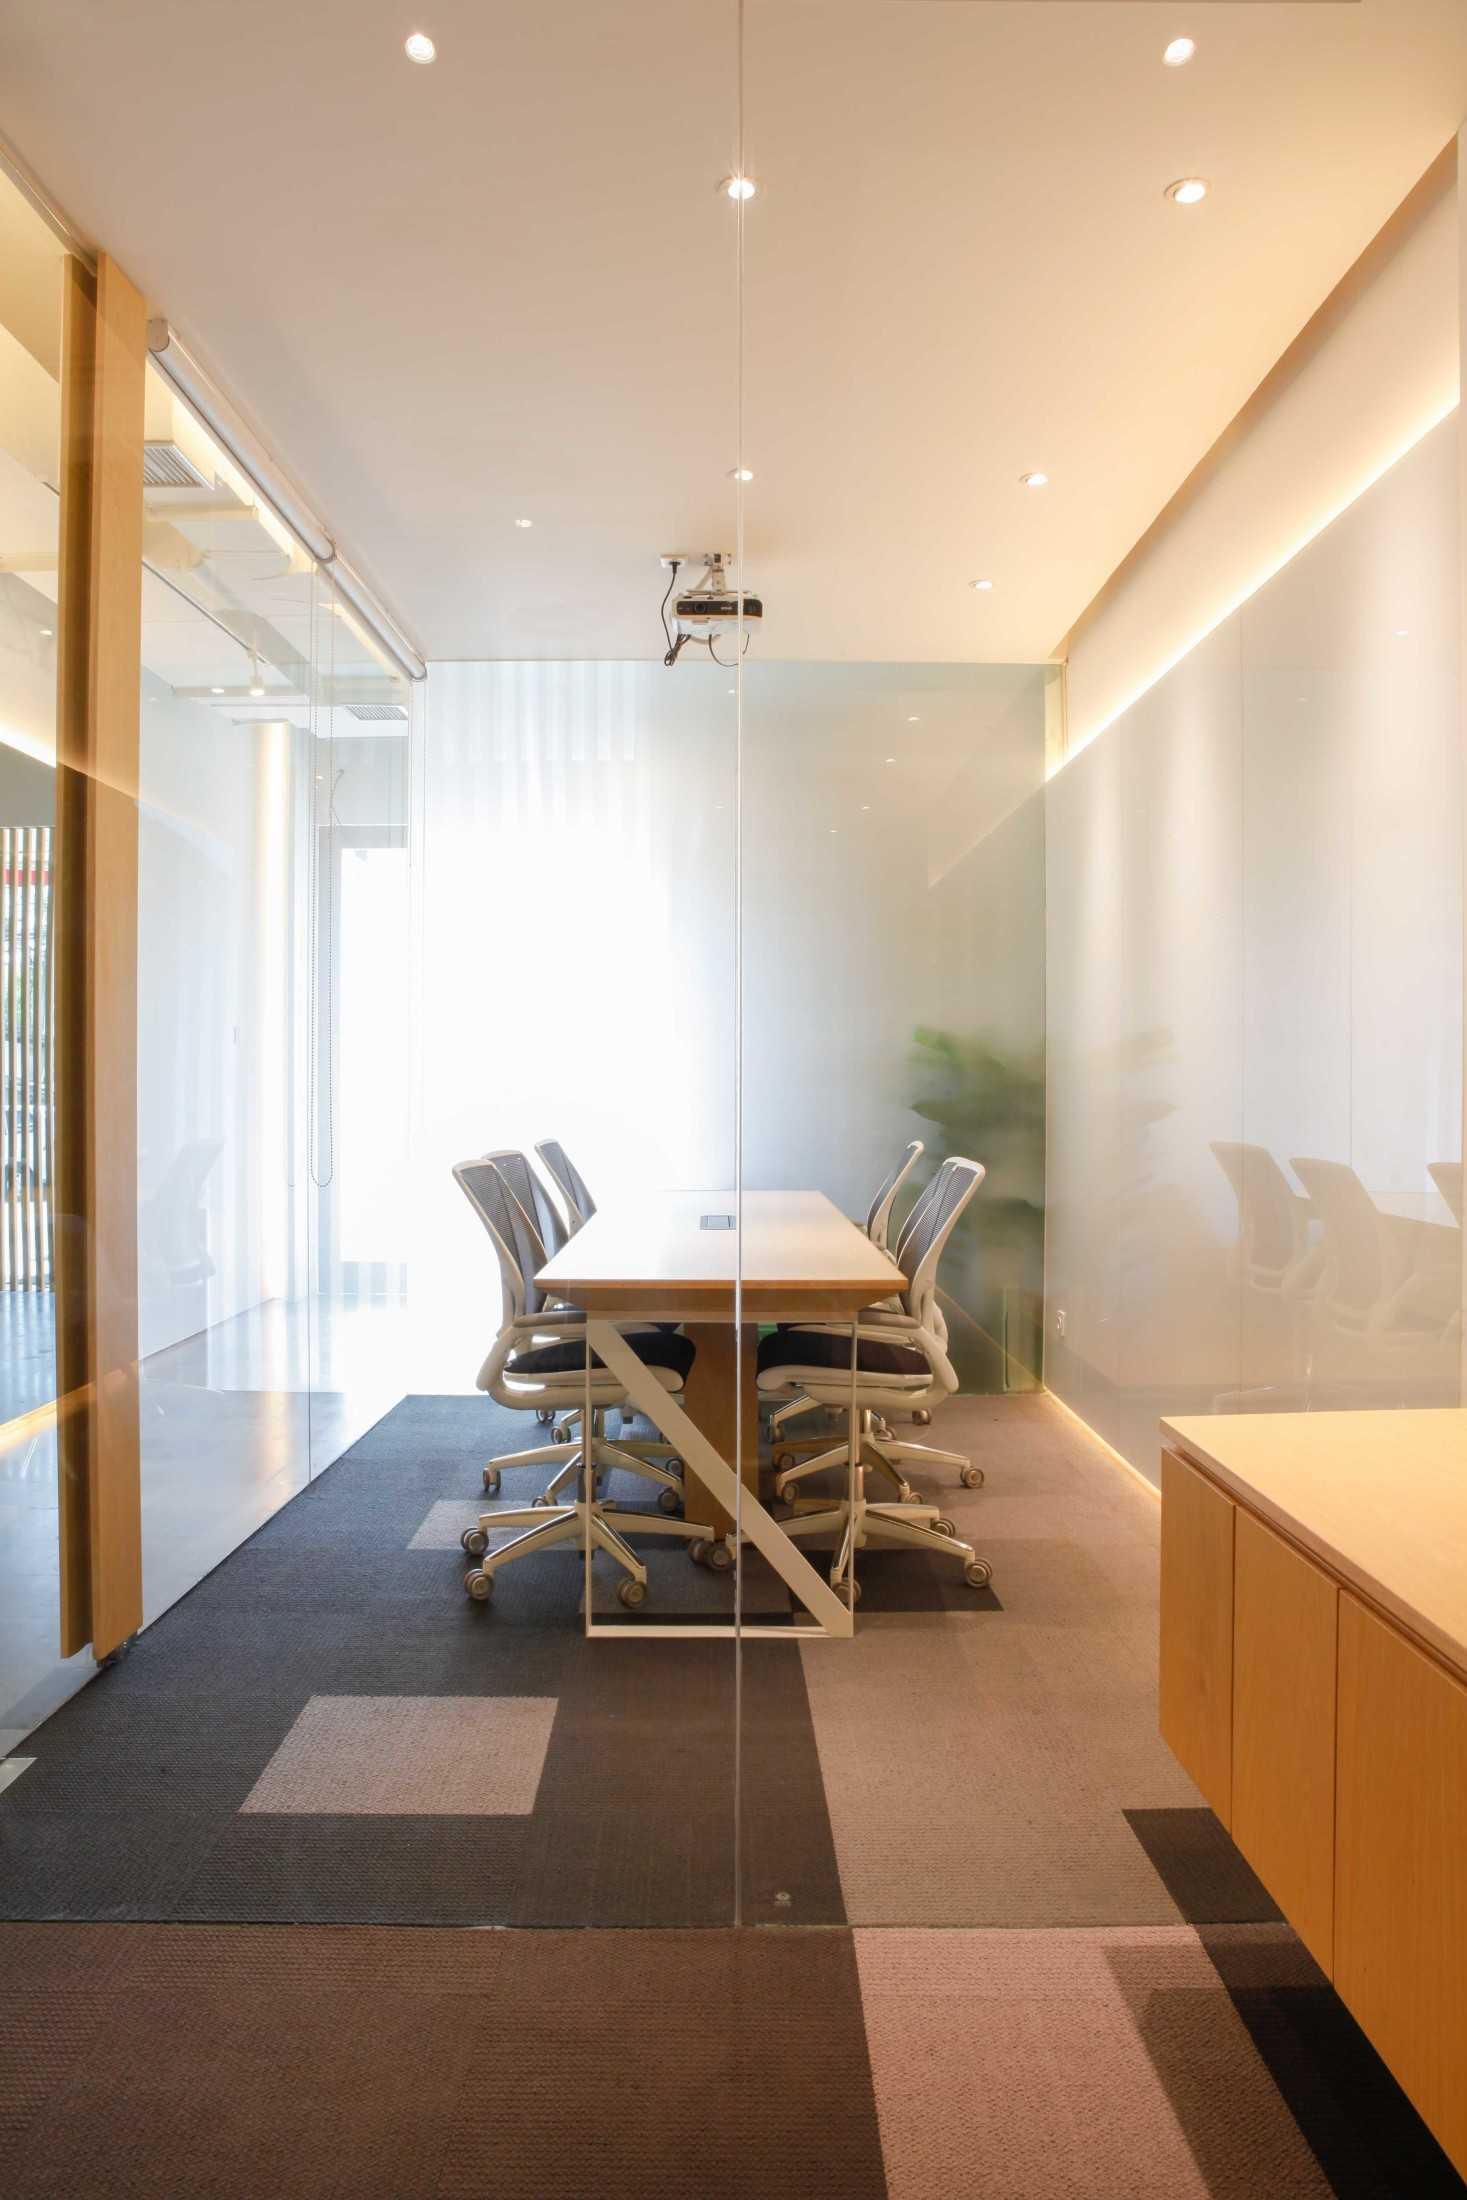 Design Intervention Simland Office Jakarta, Daerah Khusus Ibukota Jakarta, Indonesia Jakarta, Daerah Khusus Ibukota Jakarta, Indonesia Design-Intervention-Simland-Office  71052